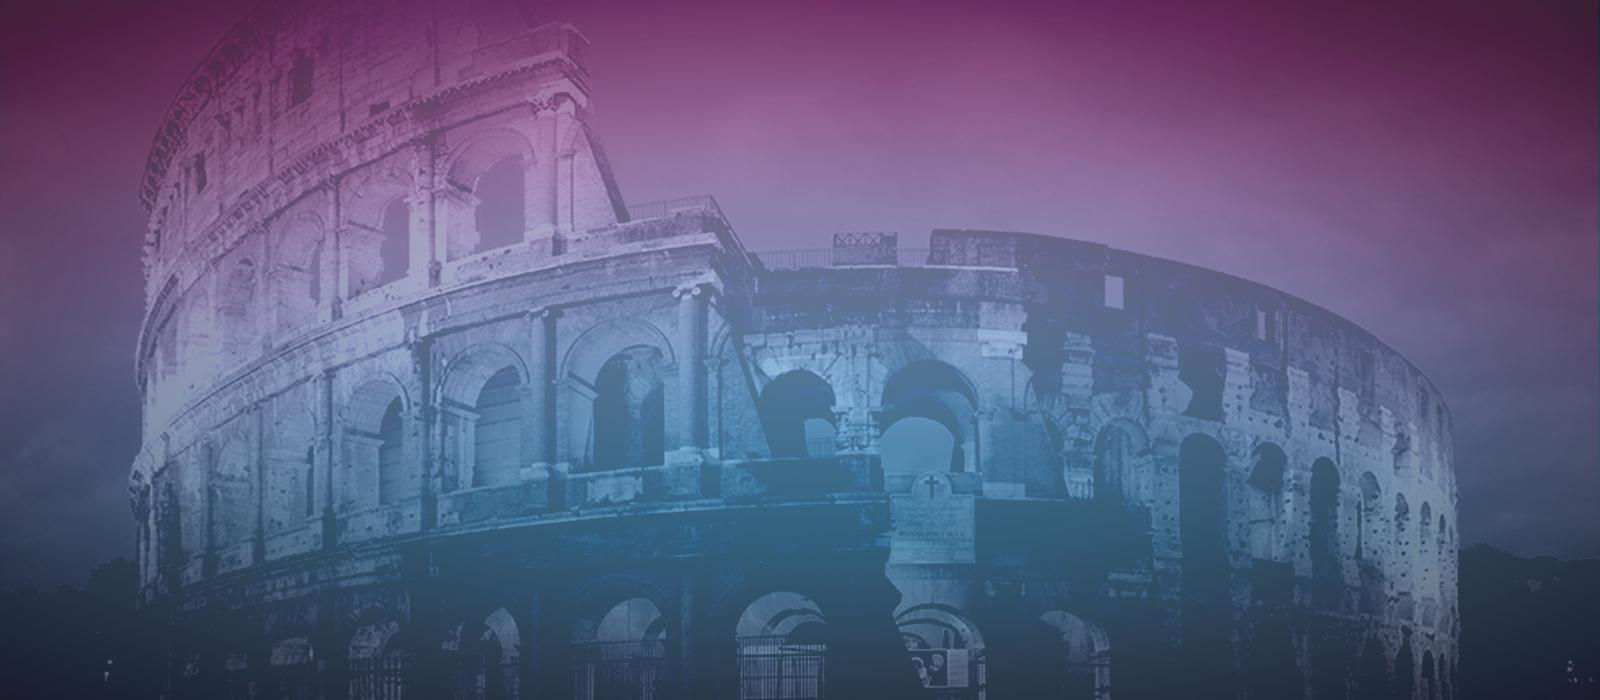 Sportska kladionica Colosseum